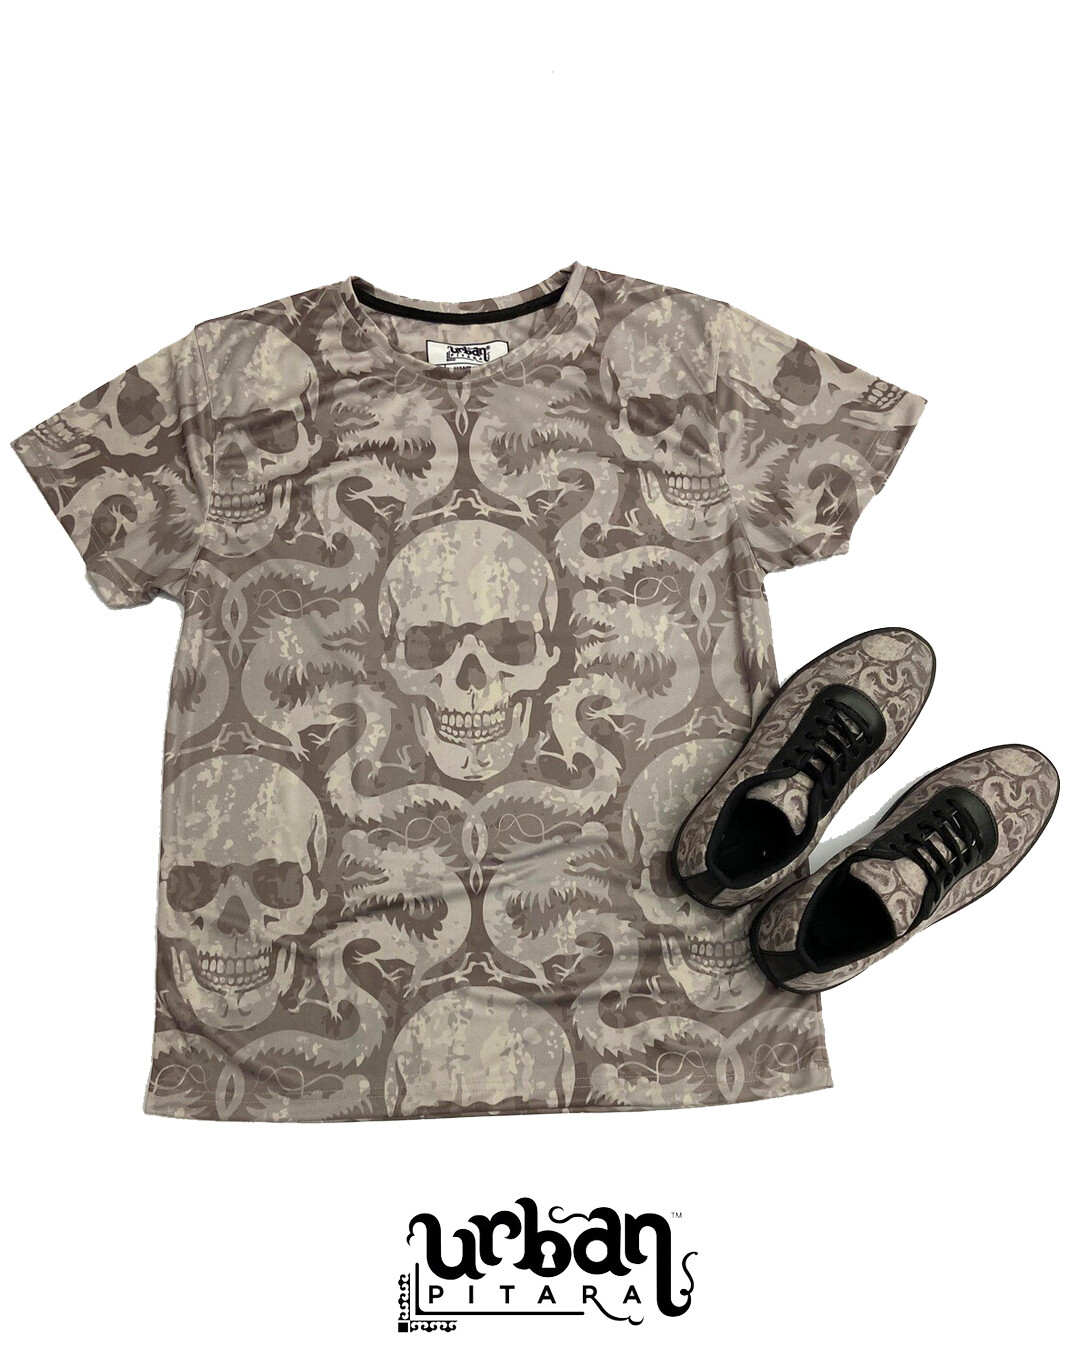 Venom Skull t-shirt and shoes Combo